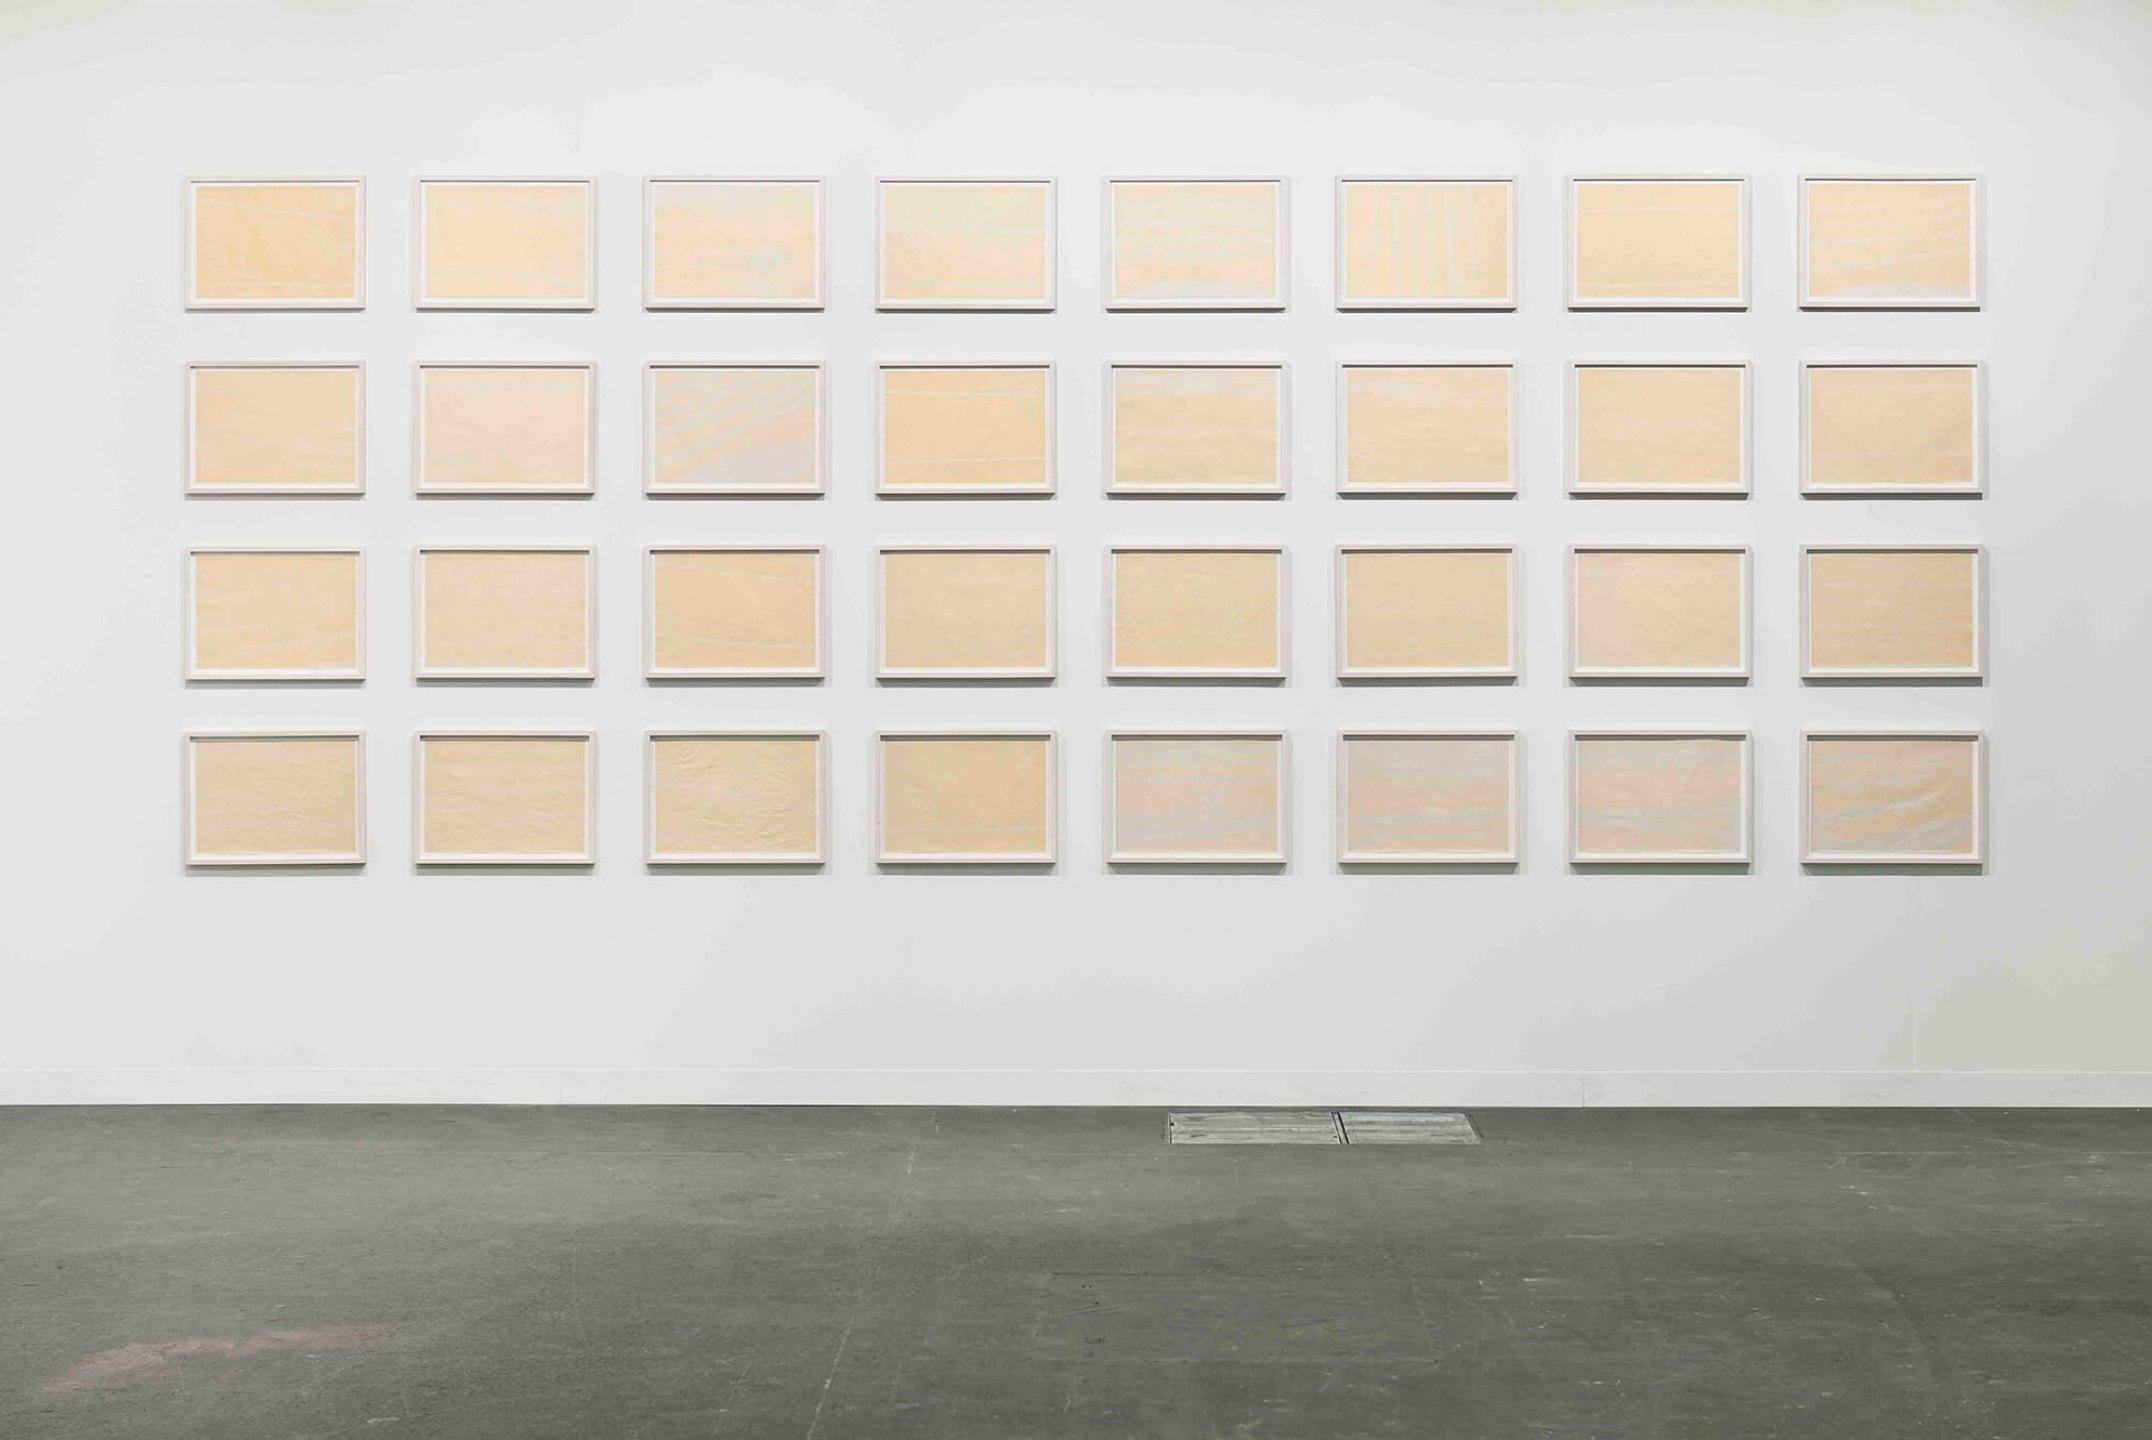 Runo Lagomarsino,<em>Trans Atlantic Thirty-two</em>,2011/2010, sun drawings and newsprint paper, 33 × 47, 5 cm (each) - Mendes Wood DM